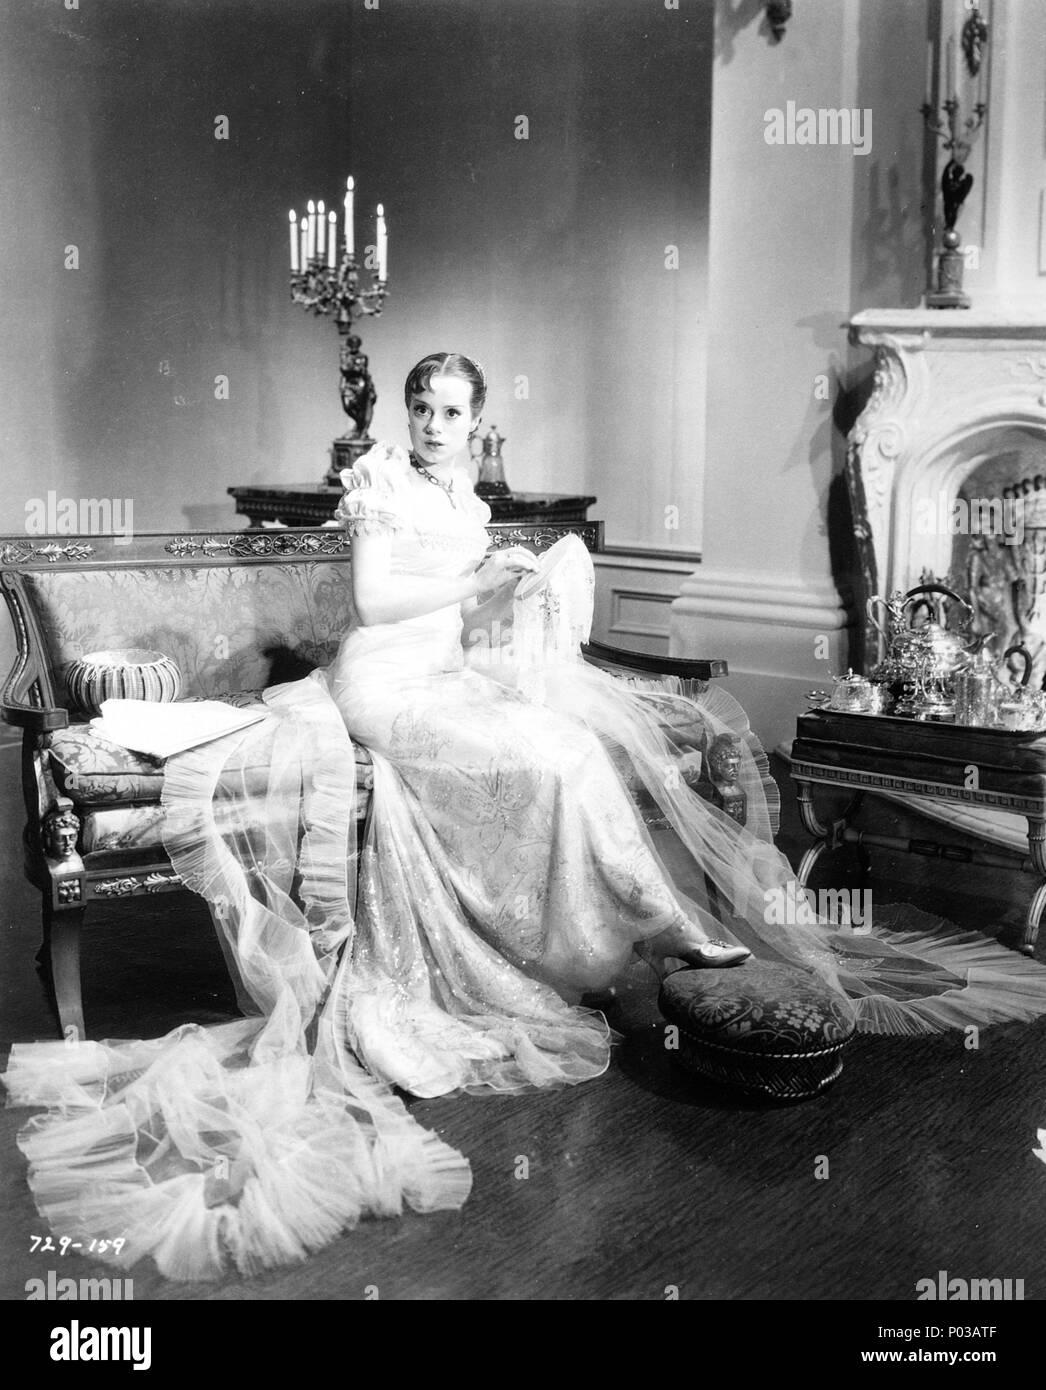 Original Film Title Bride Of Frankenstein The English Title